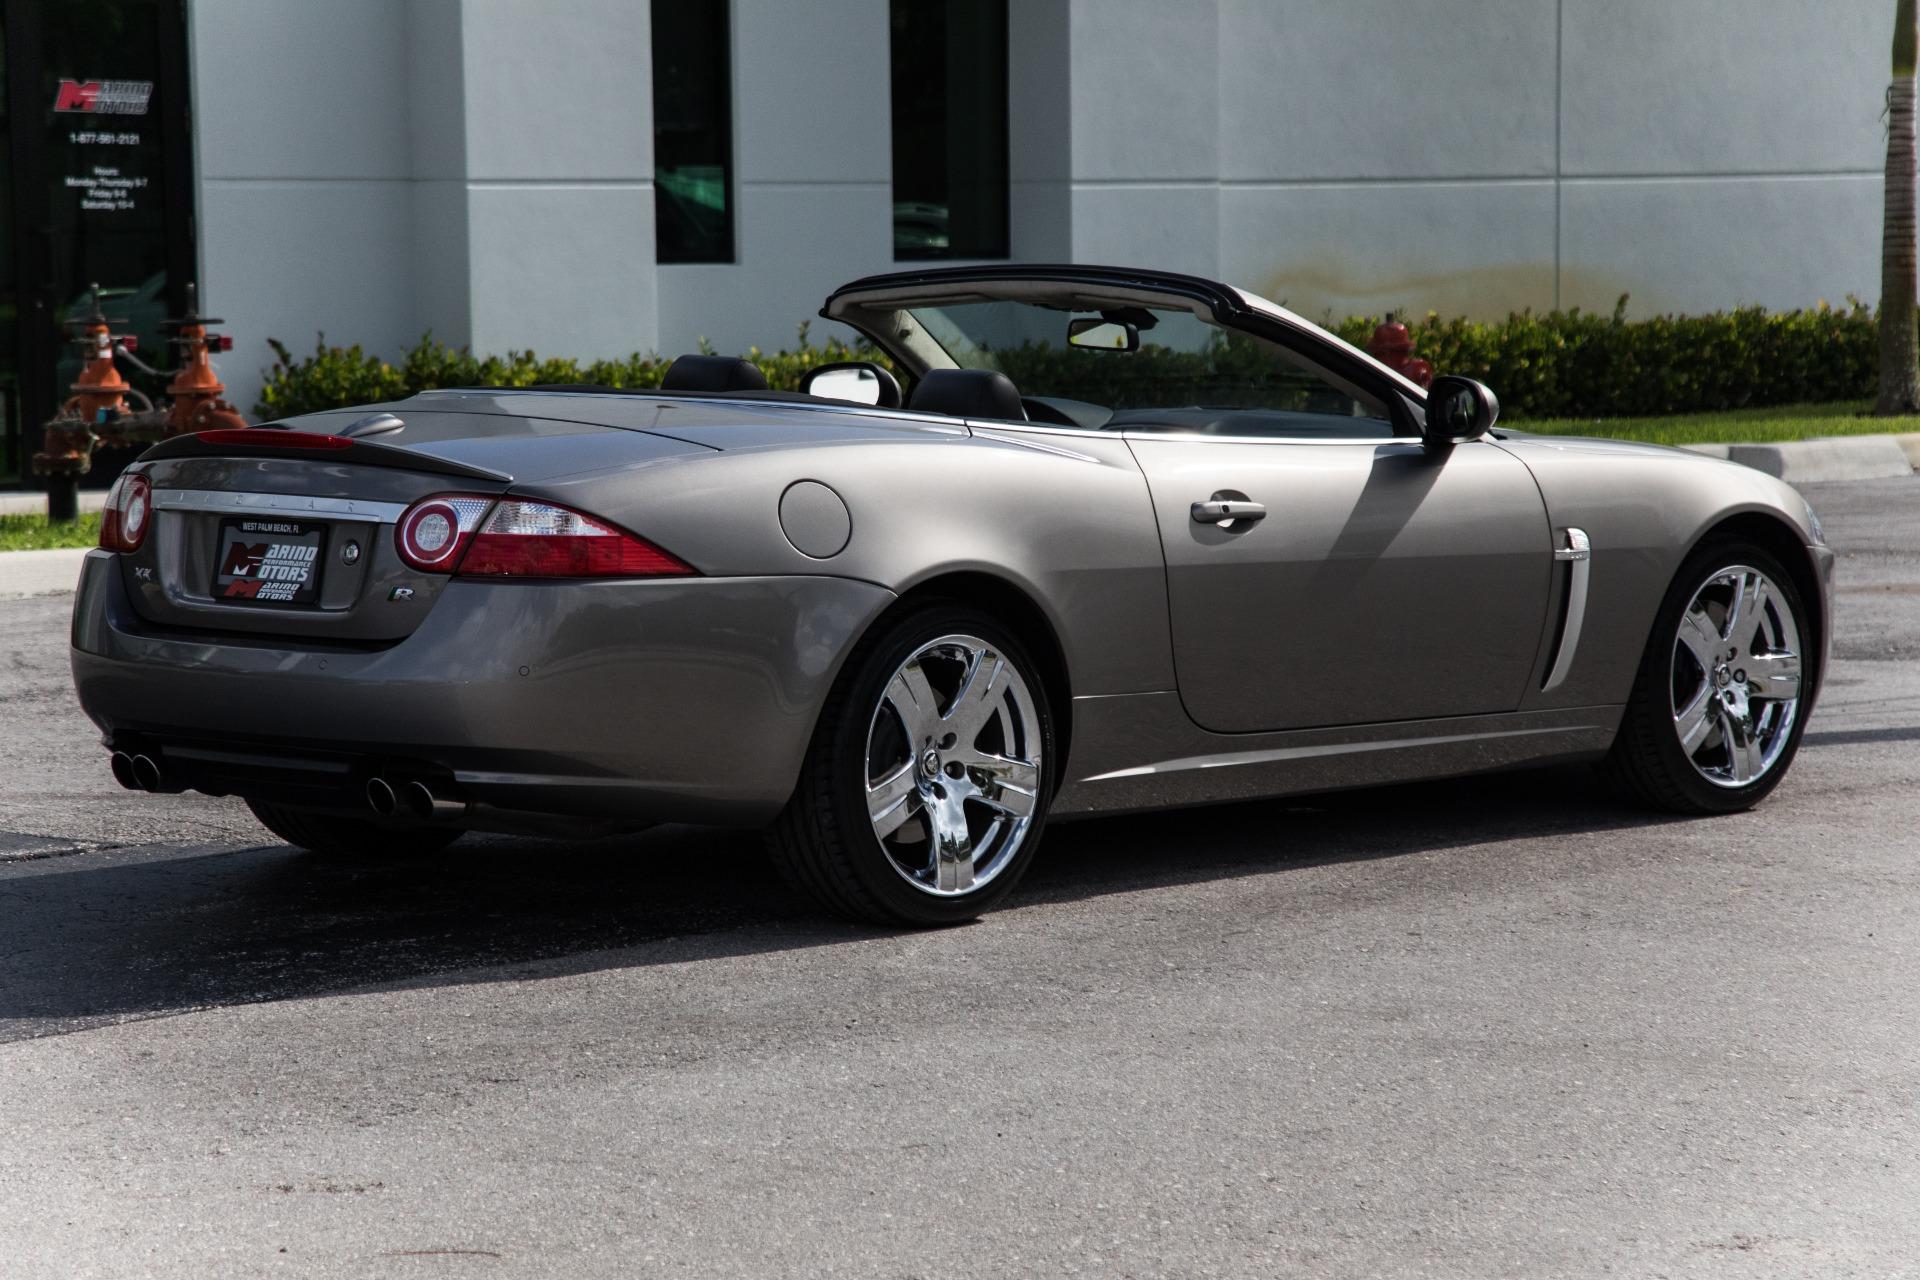 Used 2009 Jaguar XK XKR For Sale ($29,900) | Marino ...